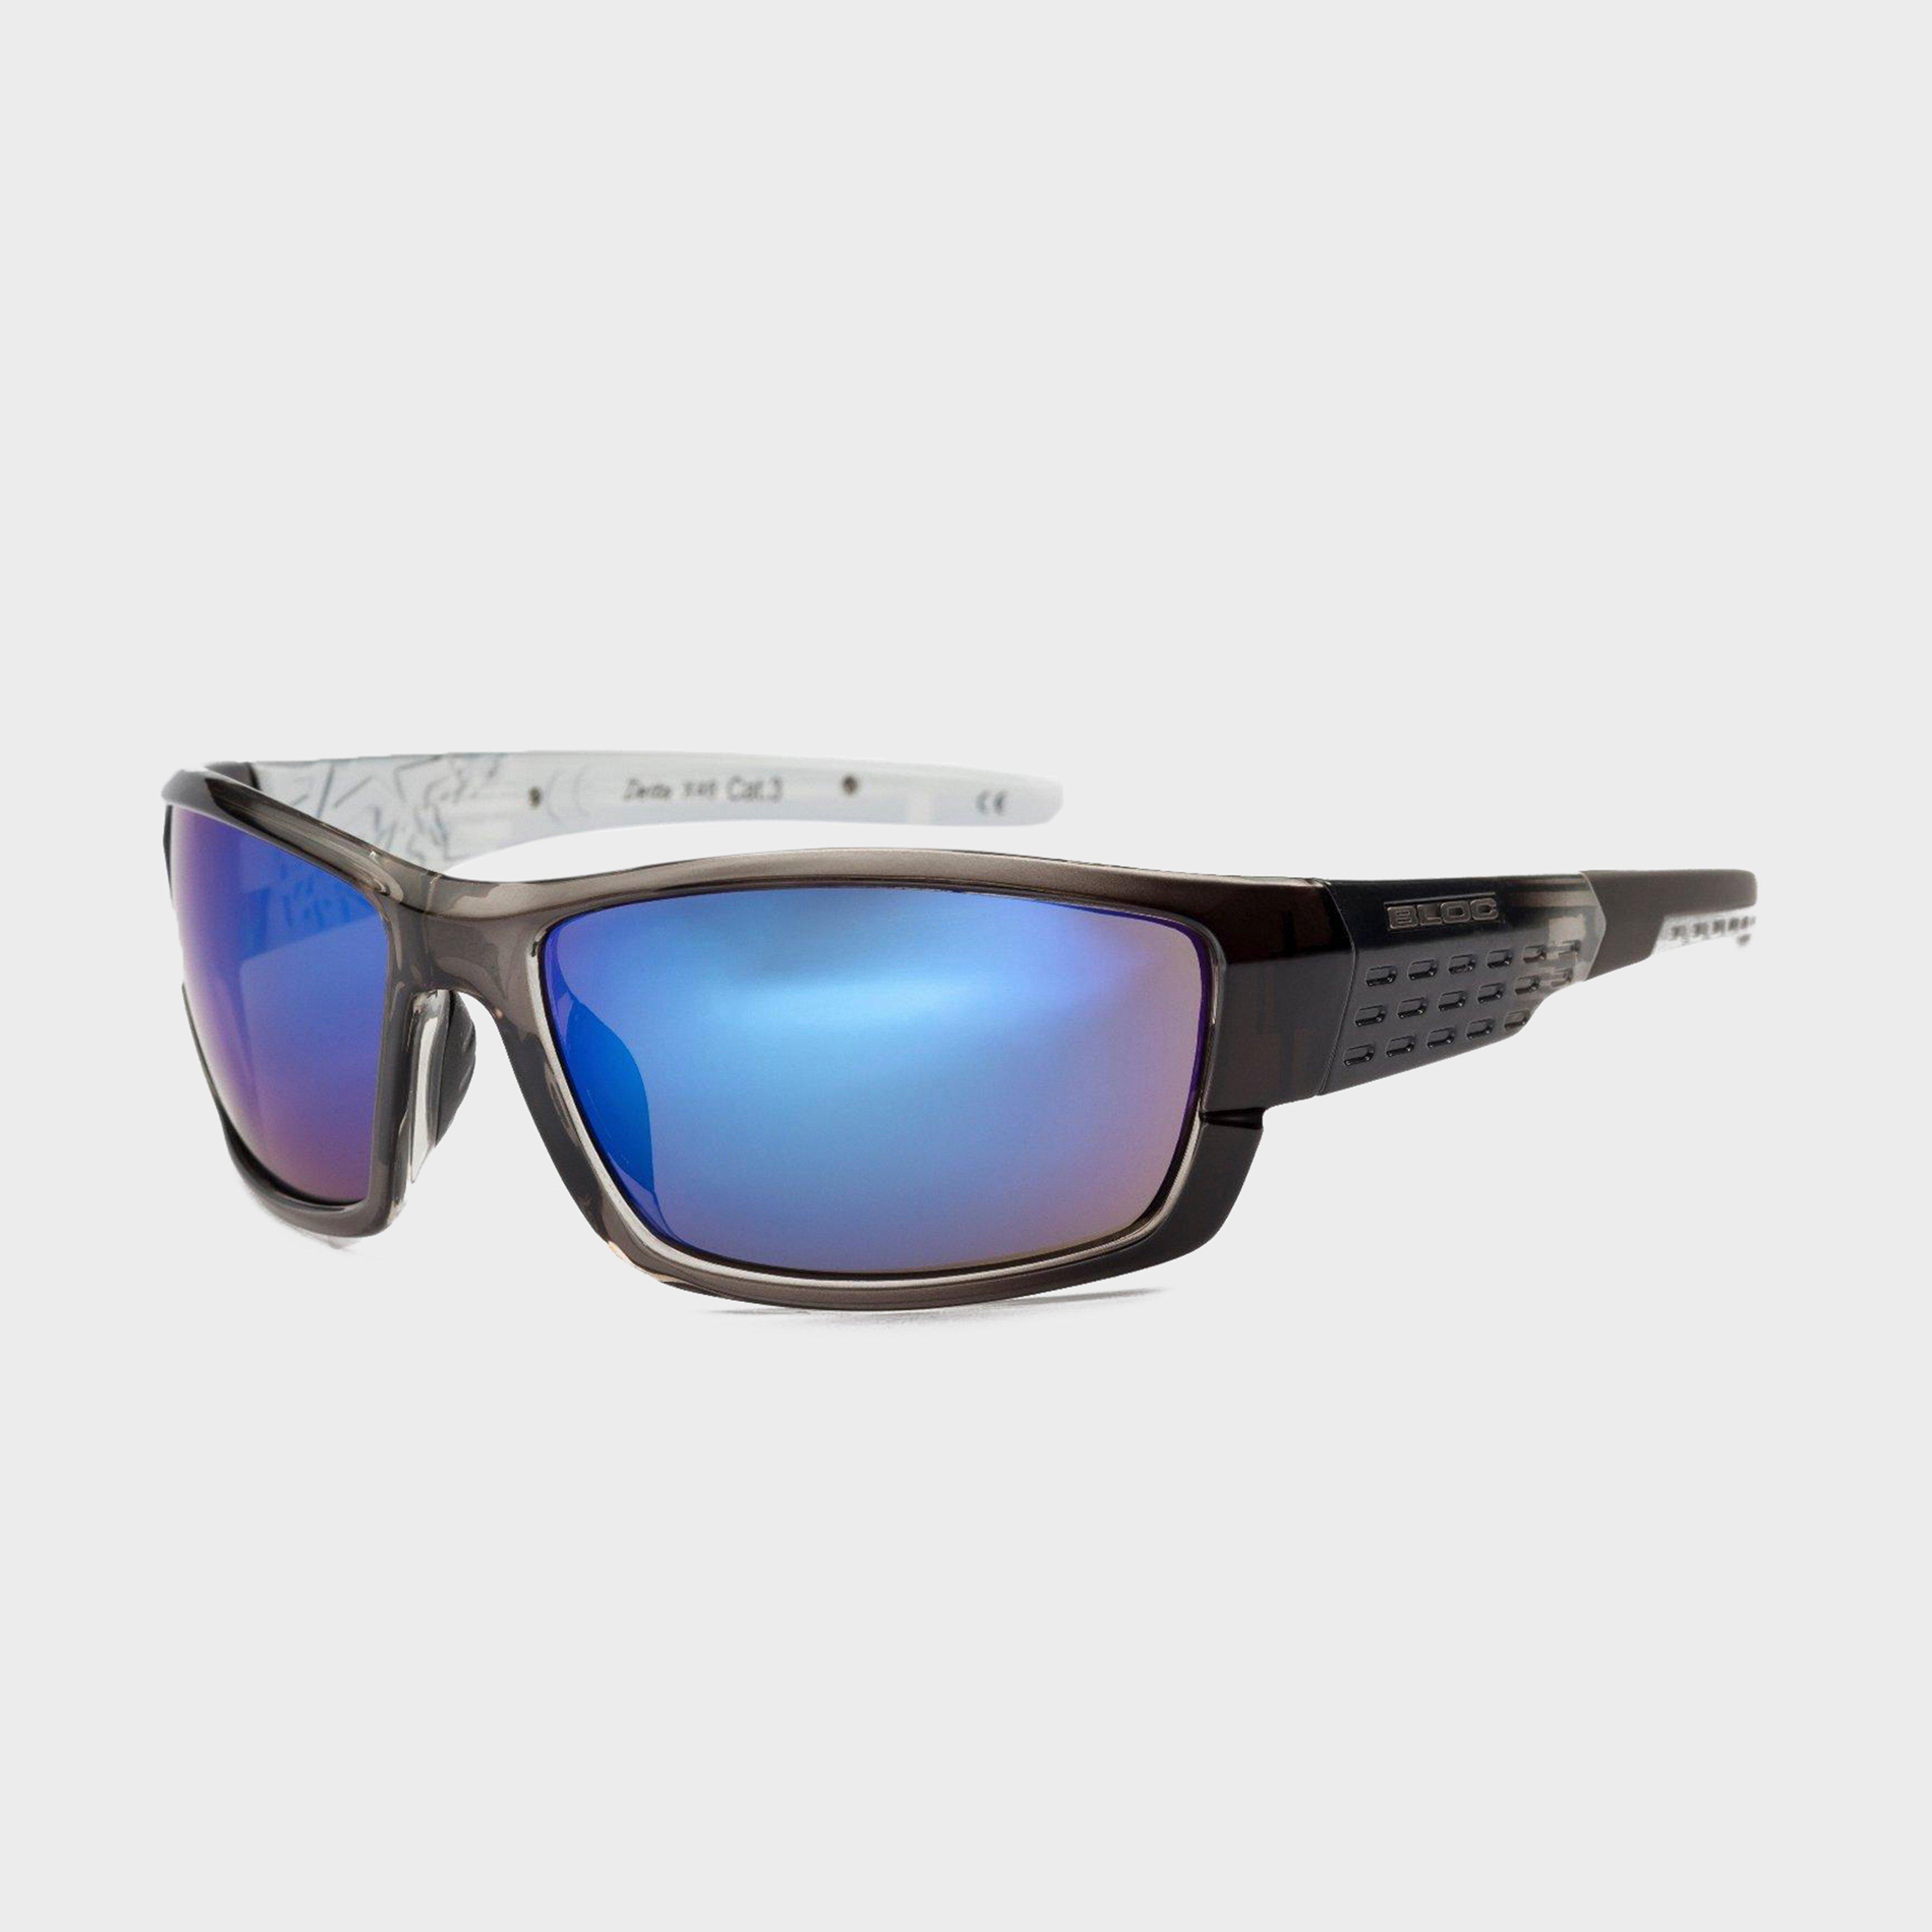 Bloc Delta X46 Sunglasses - Black/blk/blu  Black/blk/blu